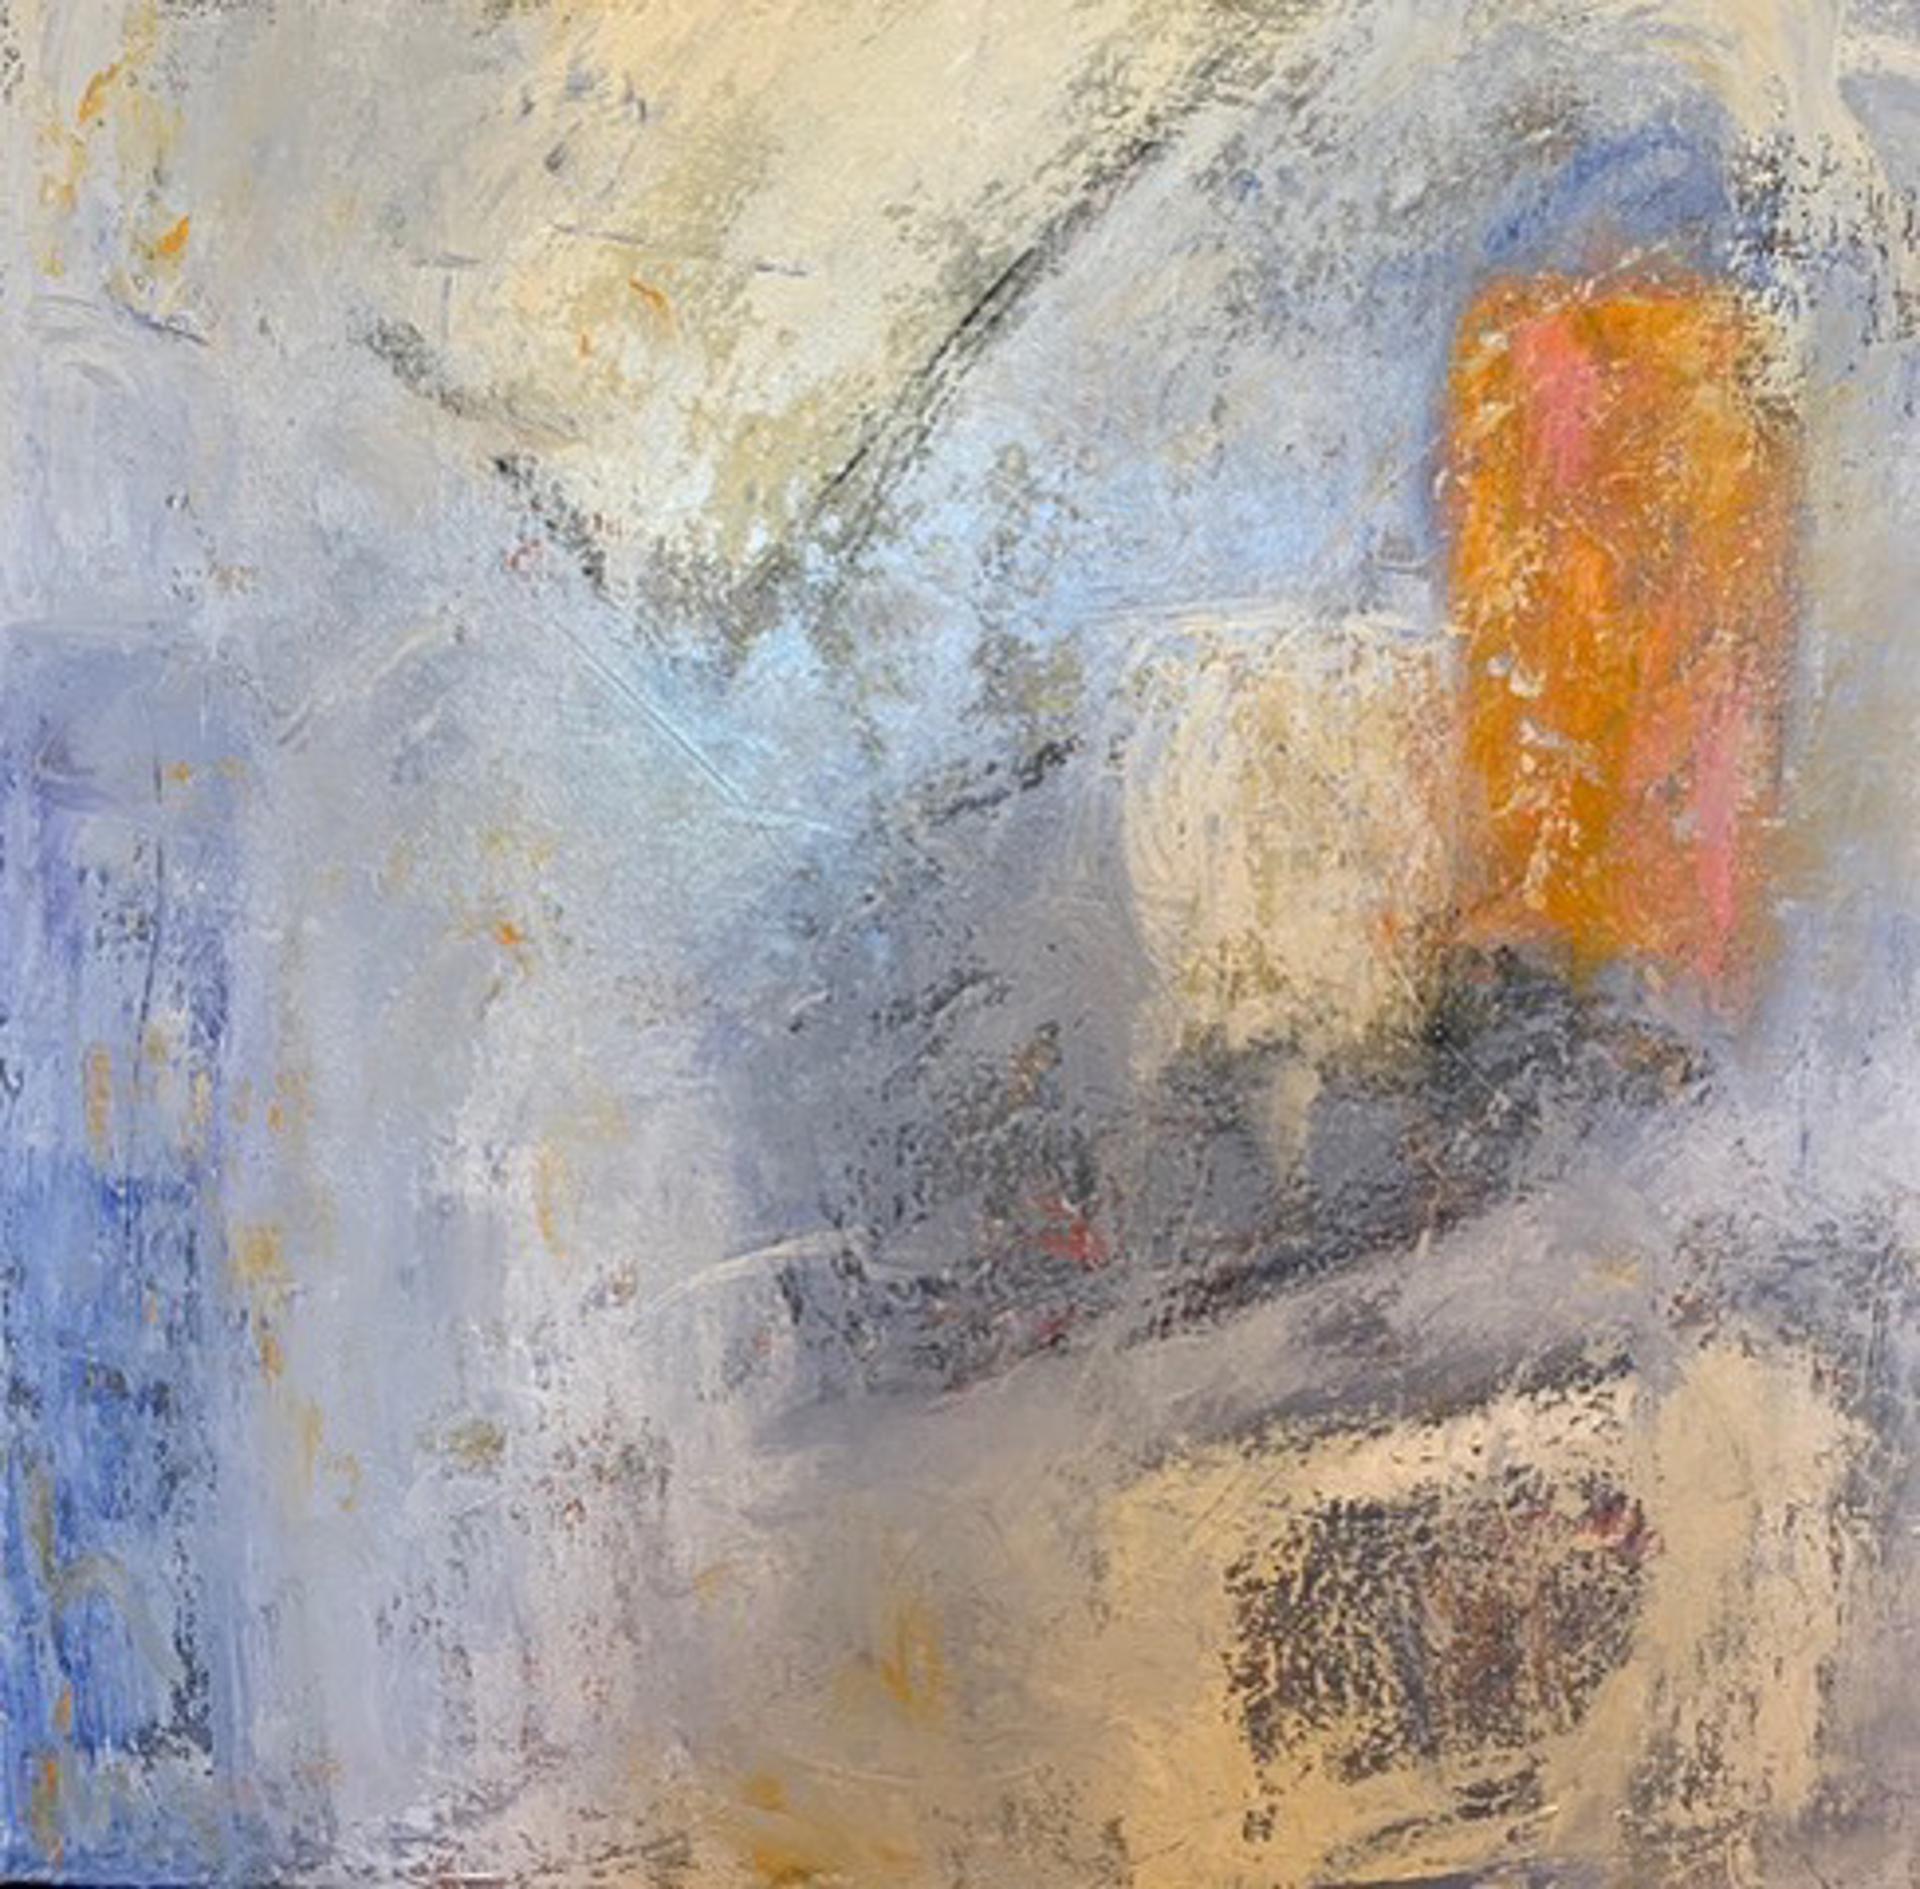 Mystic Calm by Alicia Gitlitz